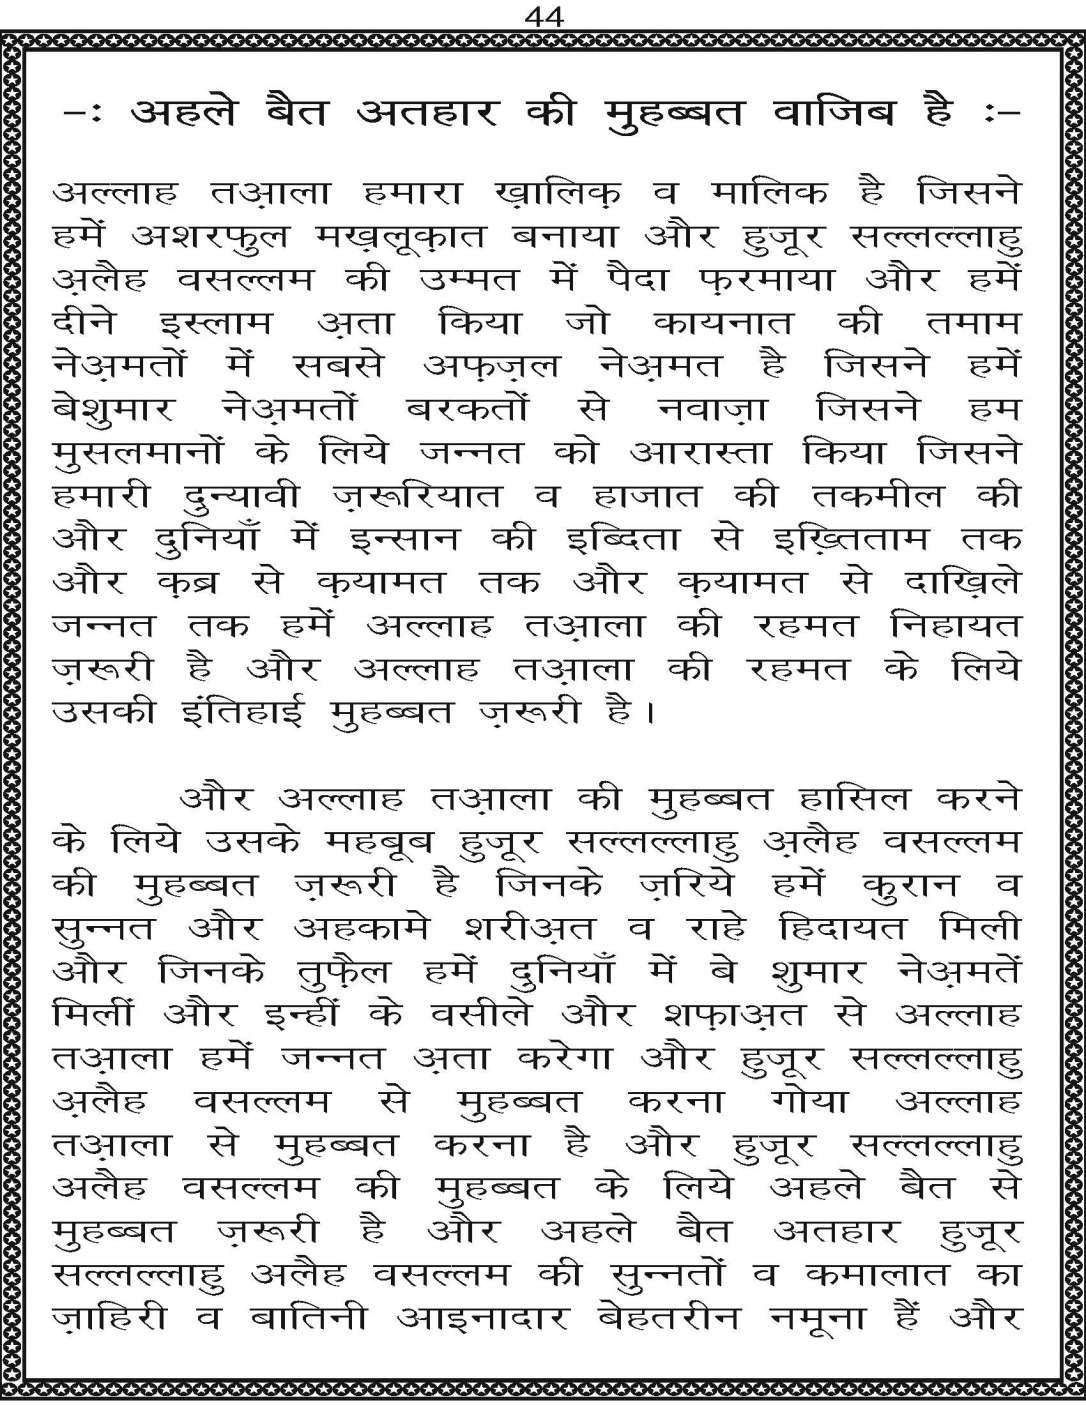 AzmateTaziyadari_Page_044